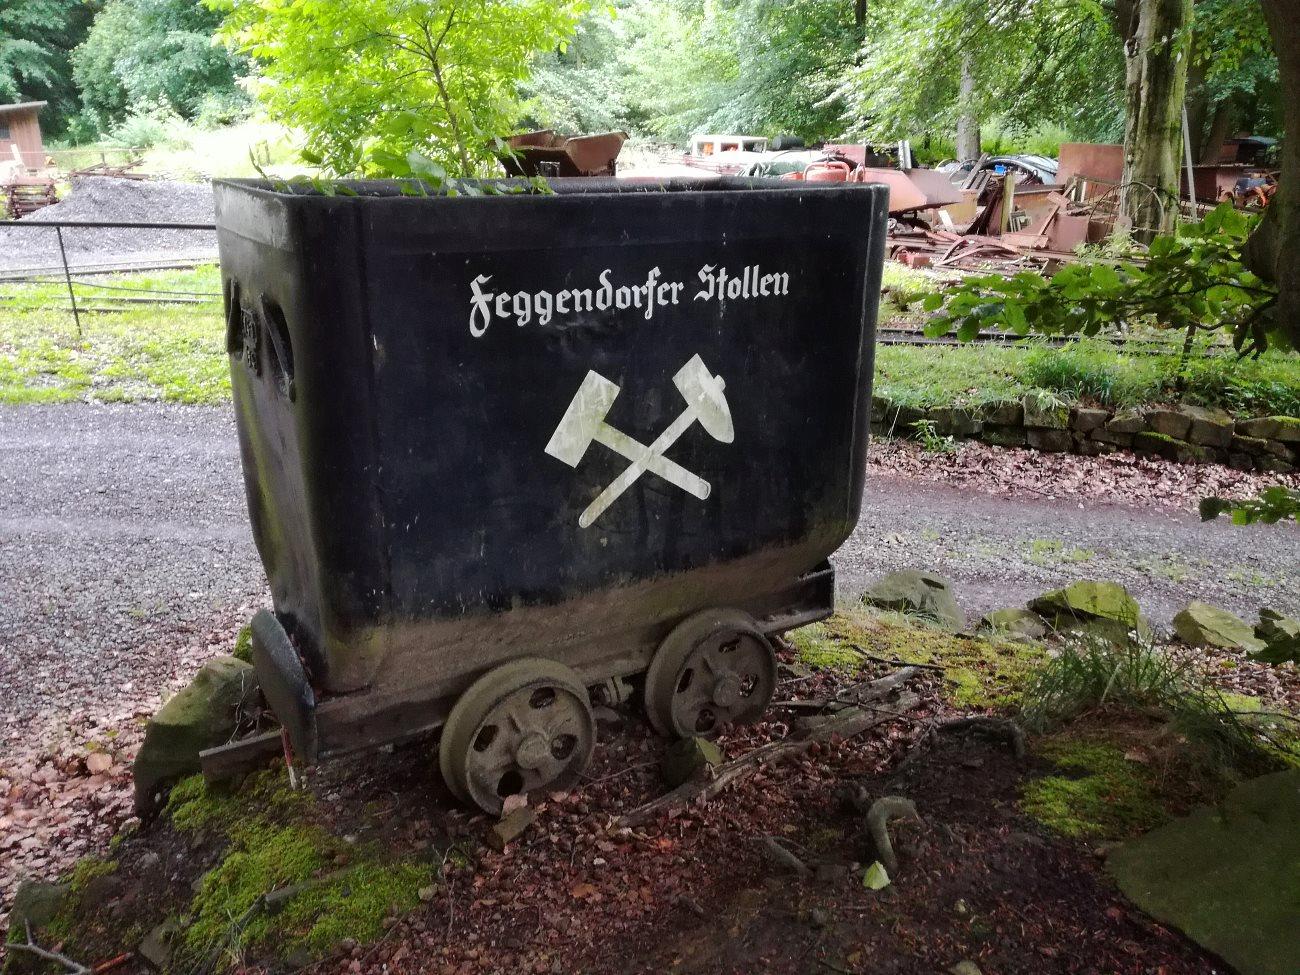 Am Feggendorfer Stollen